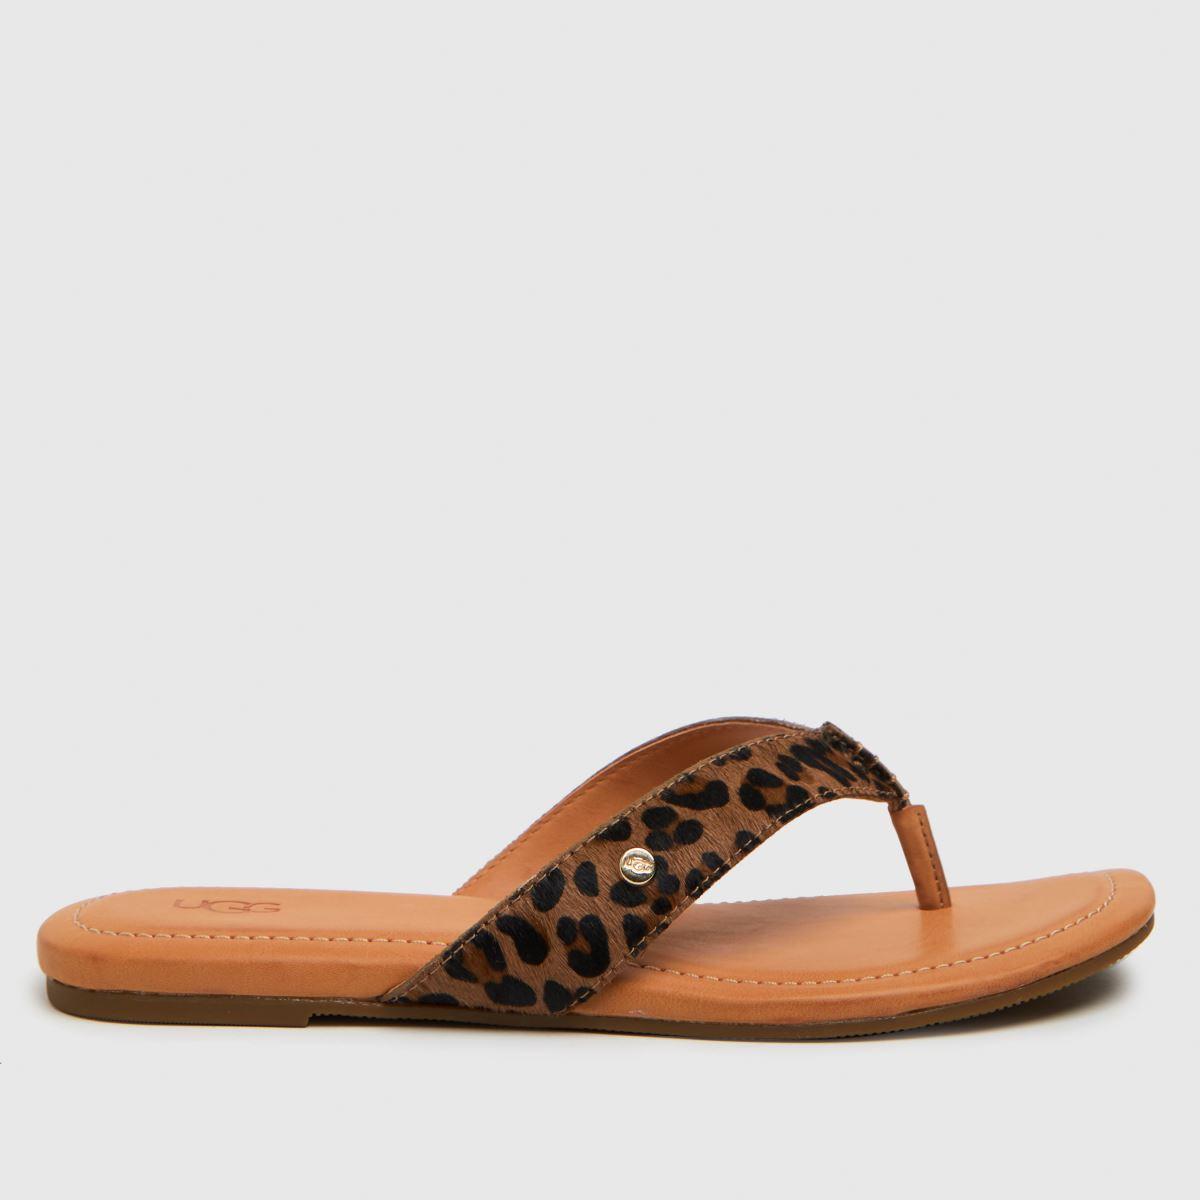 UGG Brown & Black Toulumne Leopard Sandals